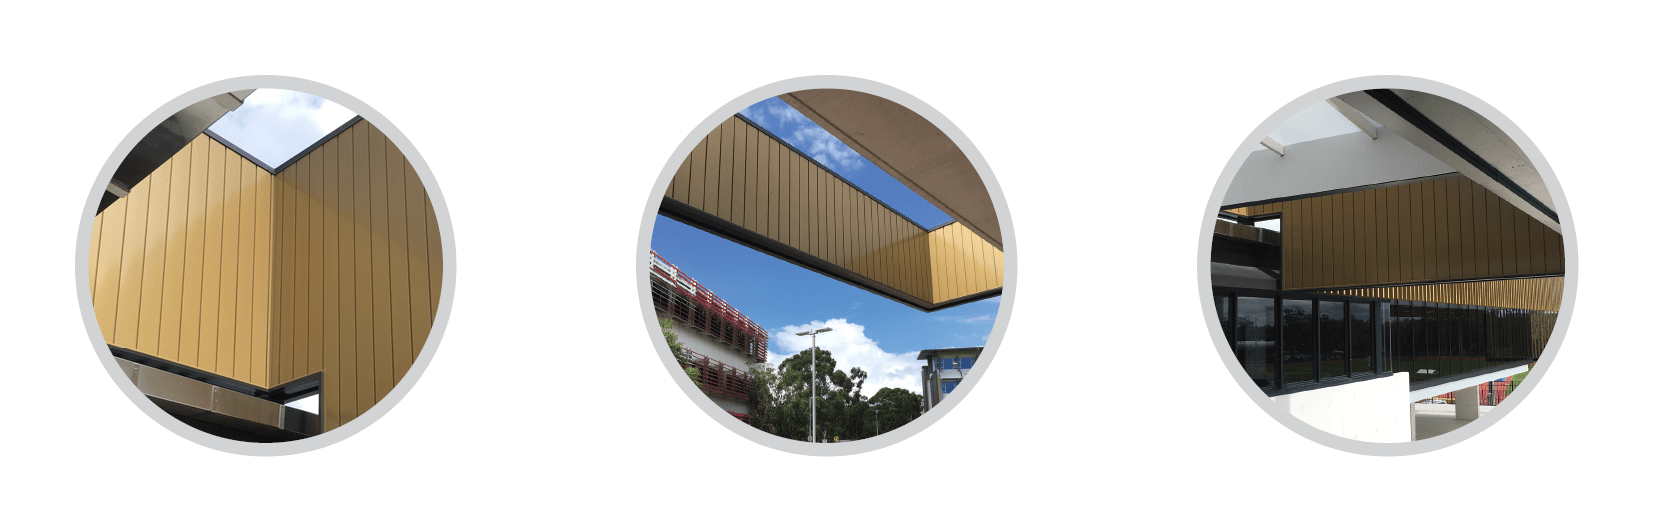 Ulltraclad Project Blurb - Griffith University